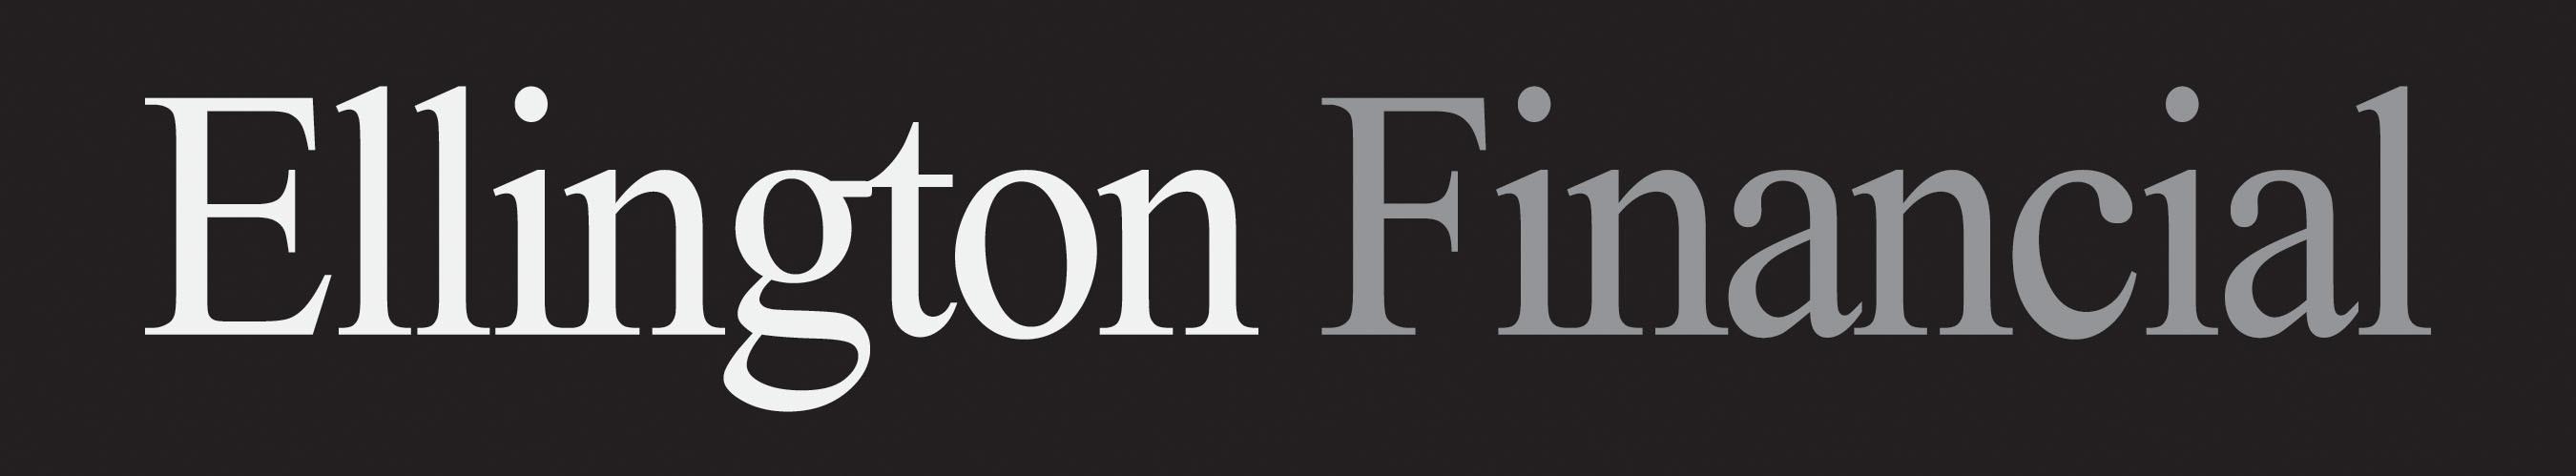 Ellington Financial LLC. (PRNewsFoto/Ellington Financial LLC) (PRNewsFoto/ELLINGTON FINANCIAL LLC)